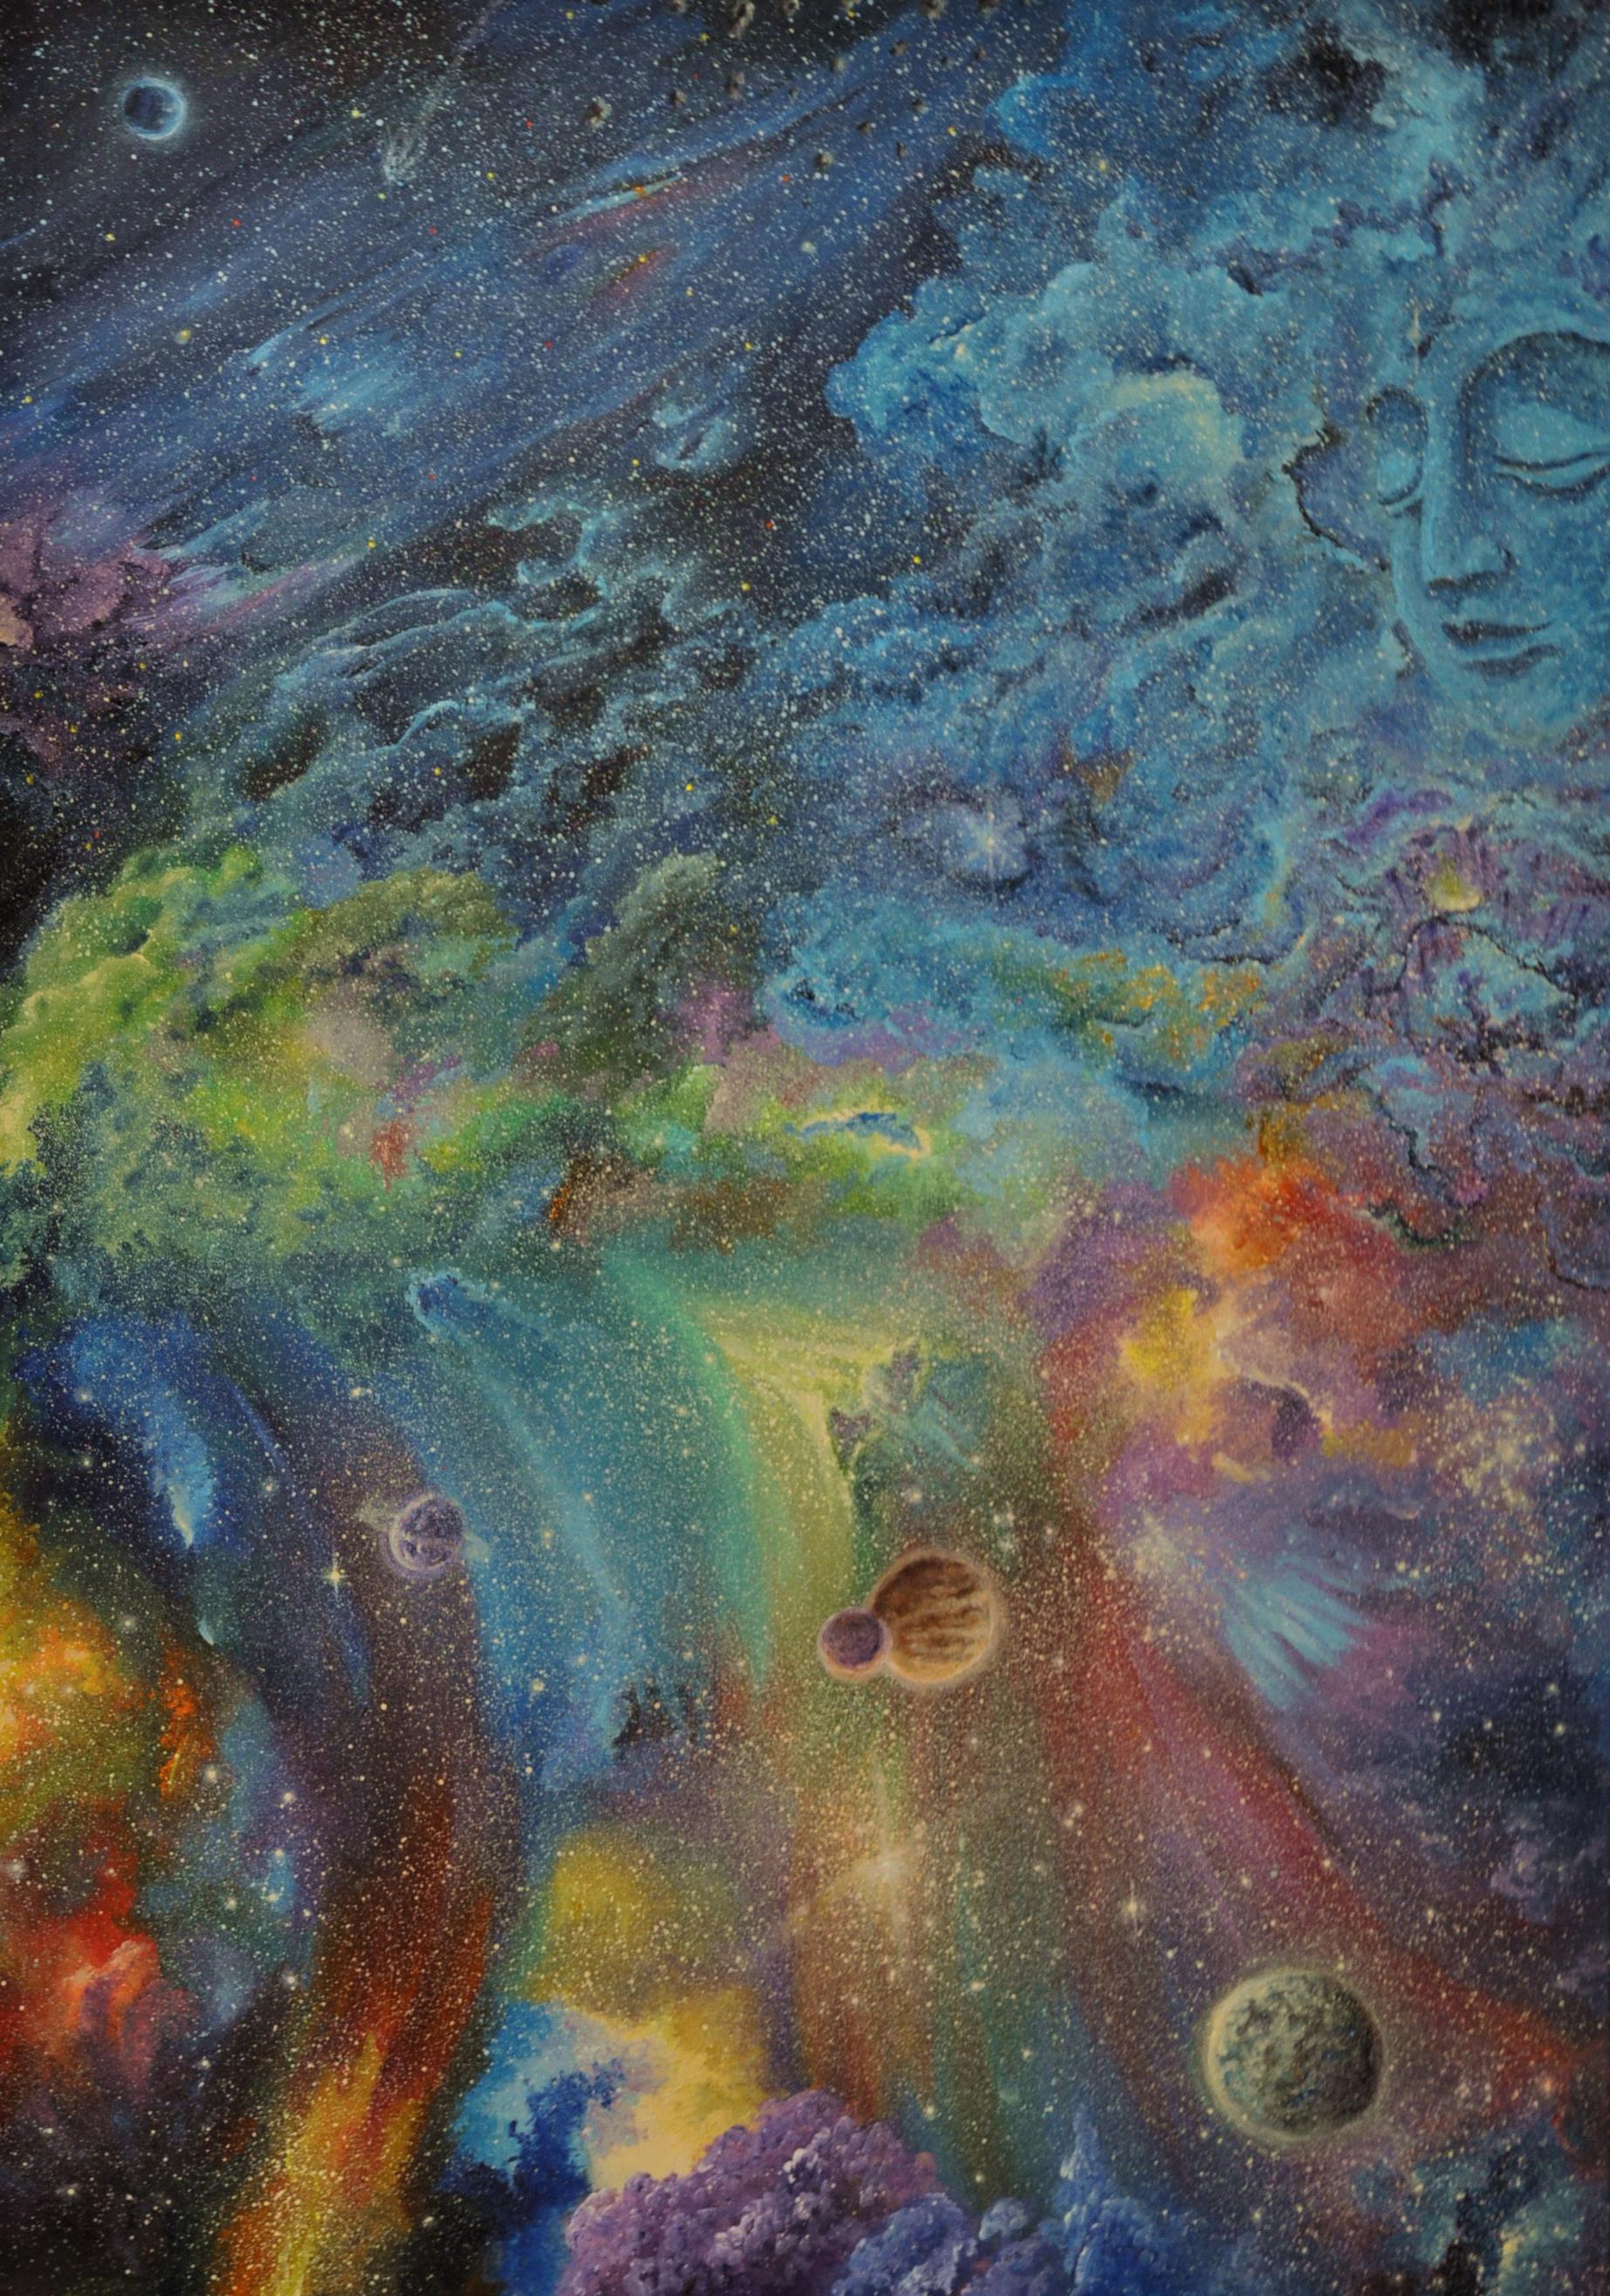 Space sounds by DenisKom